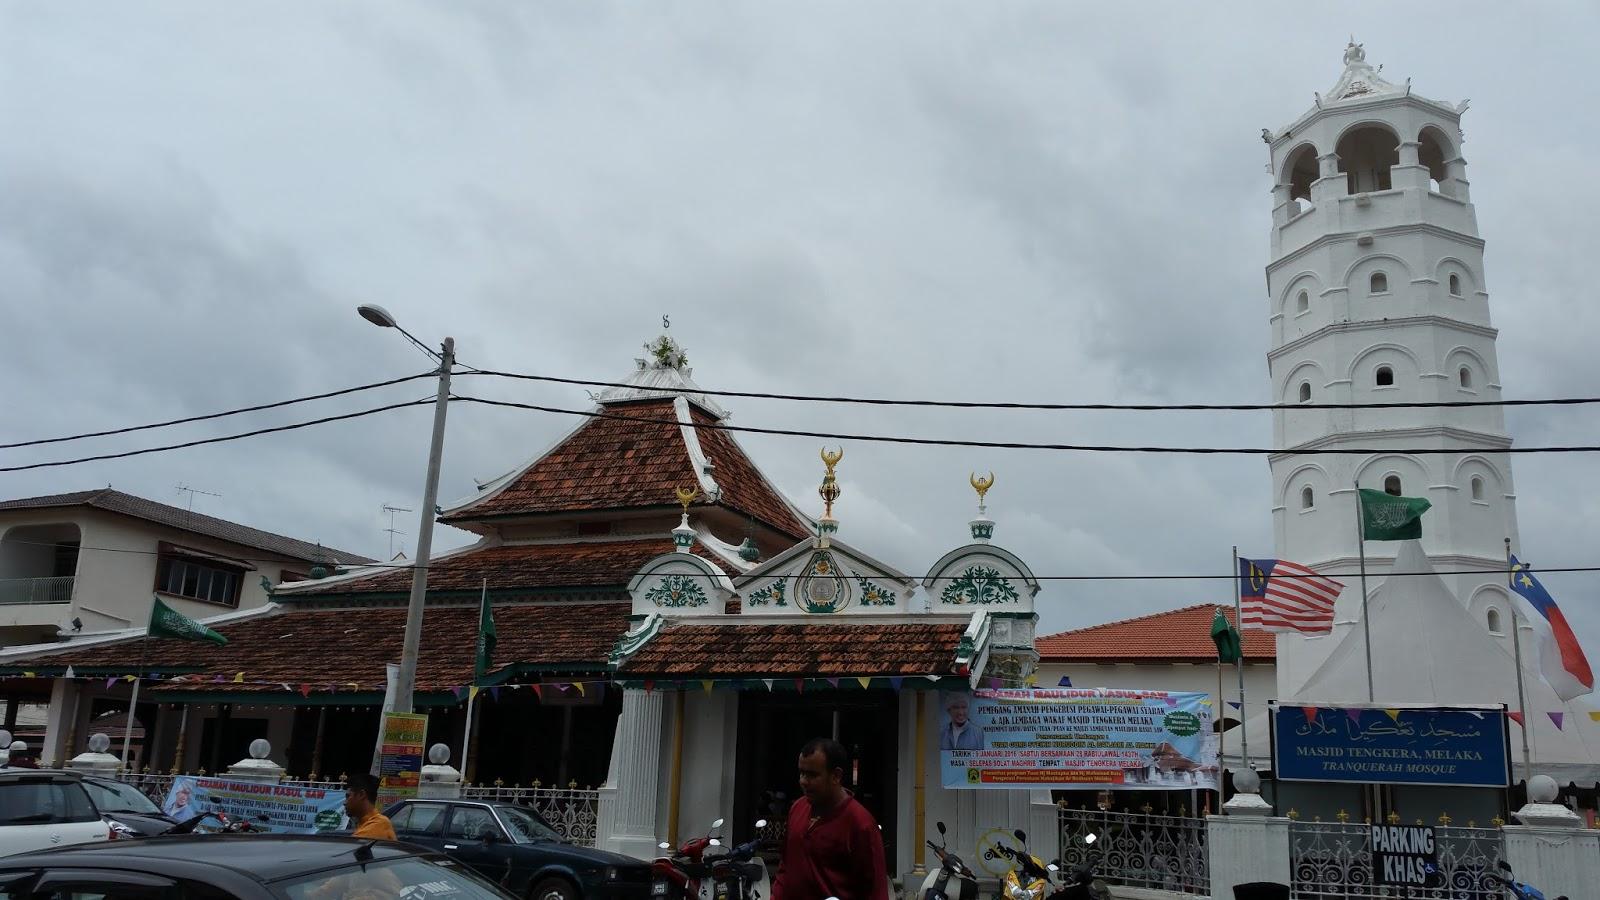 Masjid Tengkera / Tranquerah Mosque